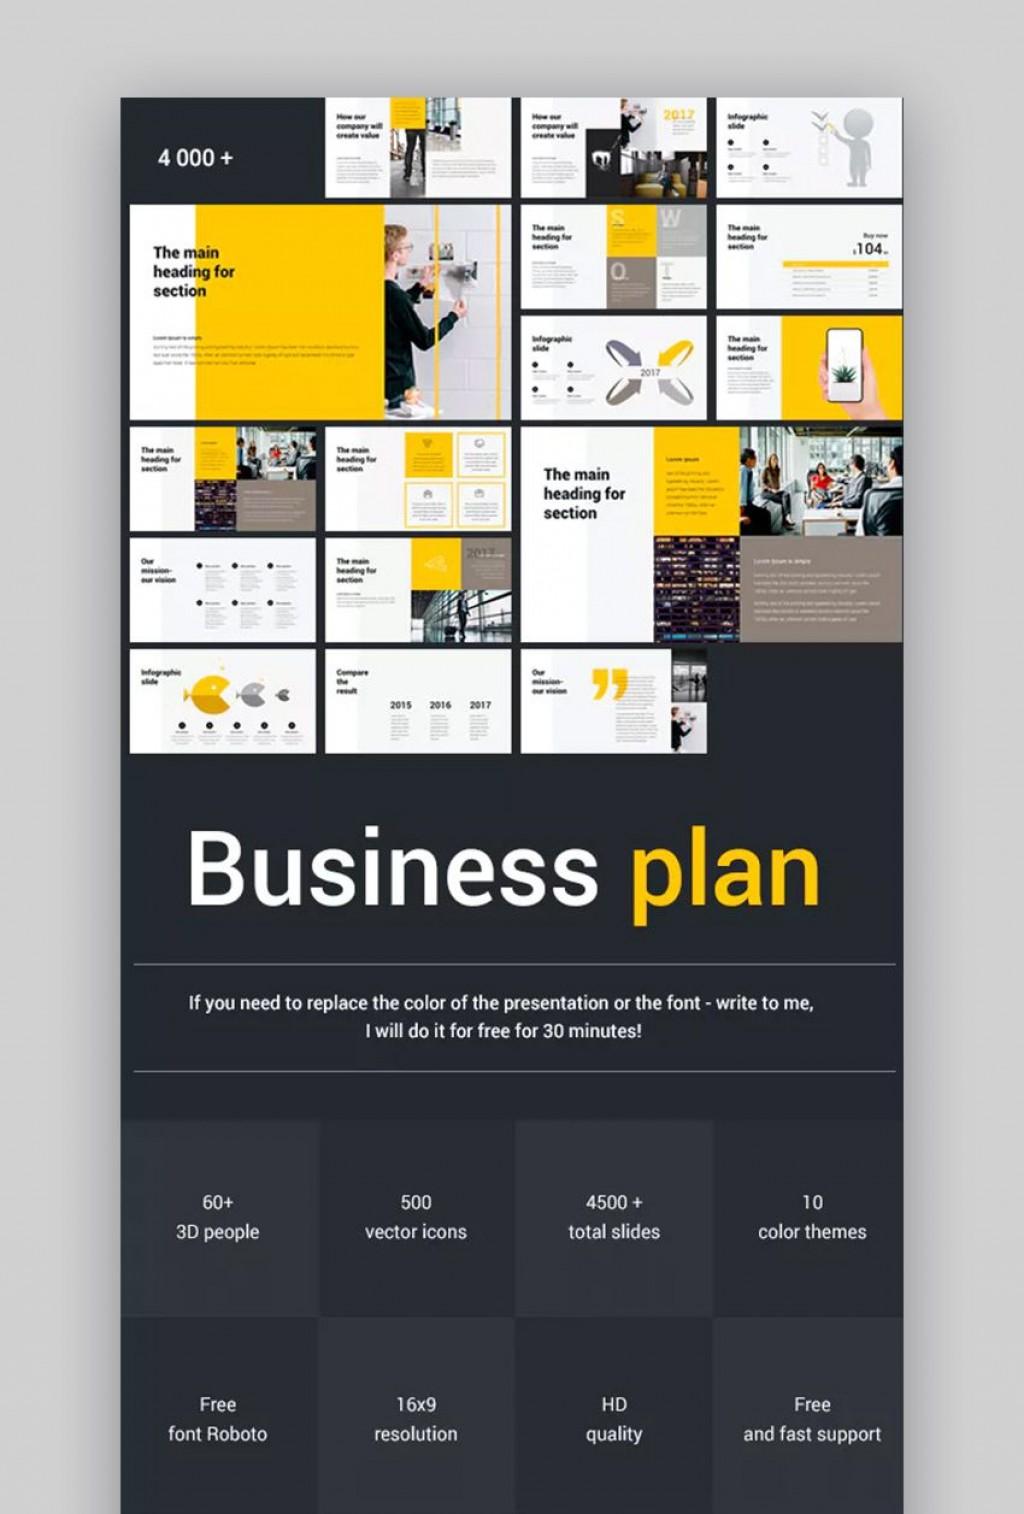 003 Formidable Free Download Busines Proposal Template Ppt Idea  Best Plan Sample Plan.ppt 2020Large